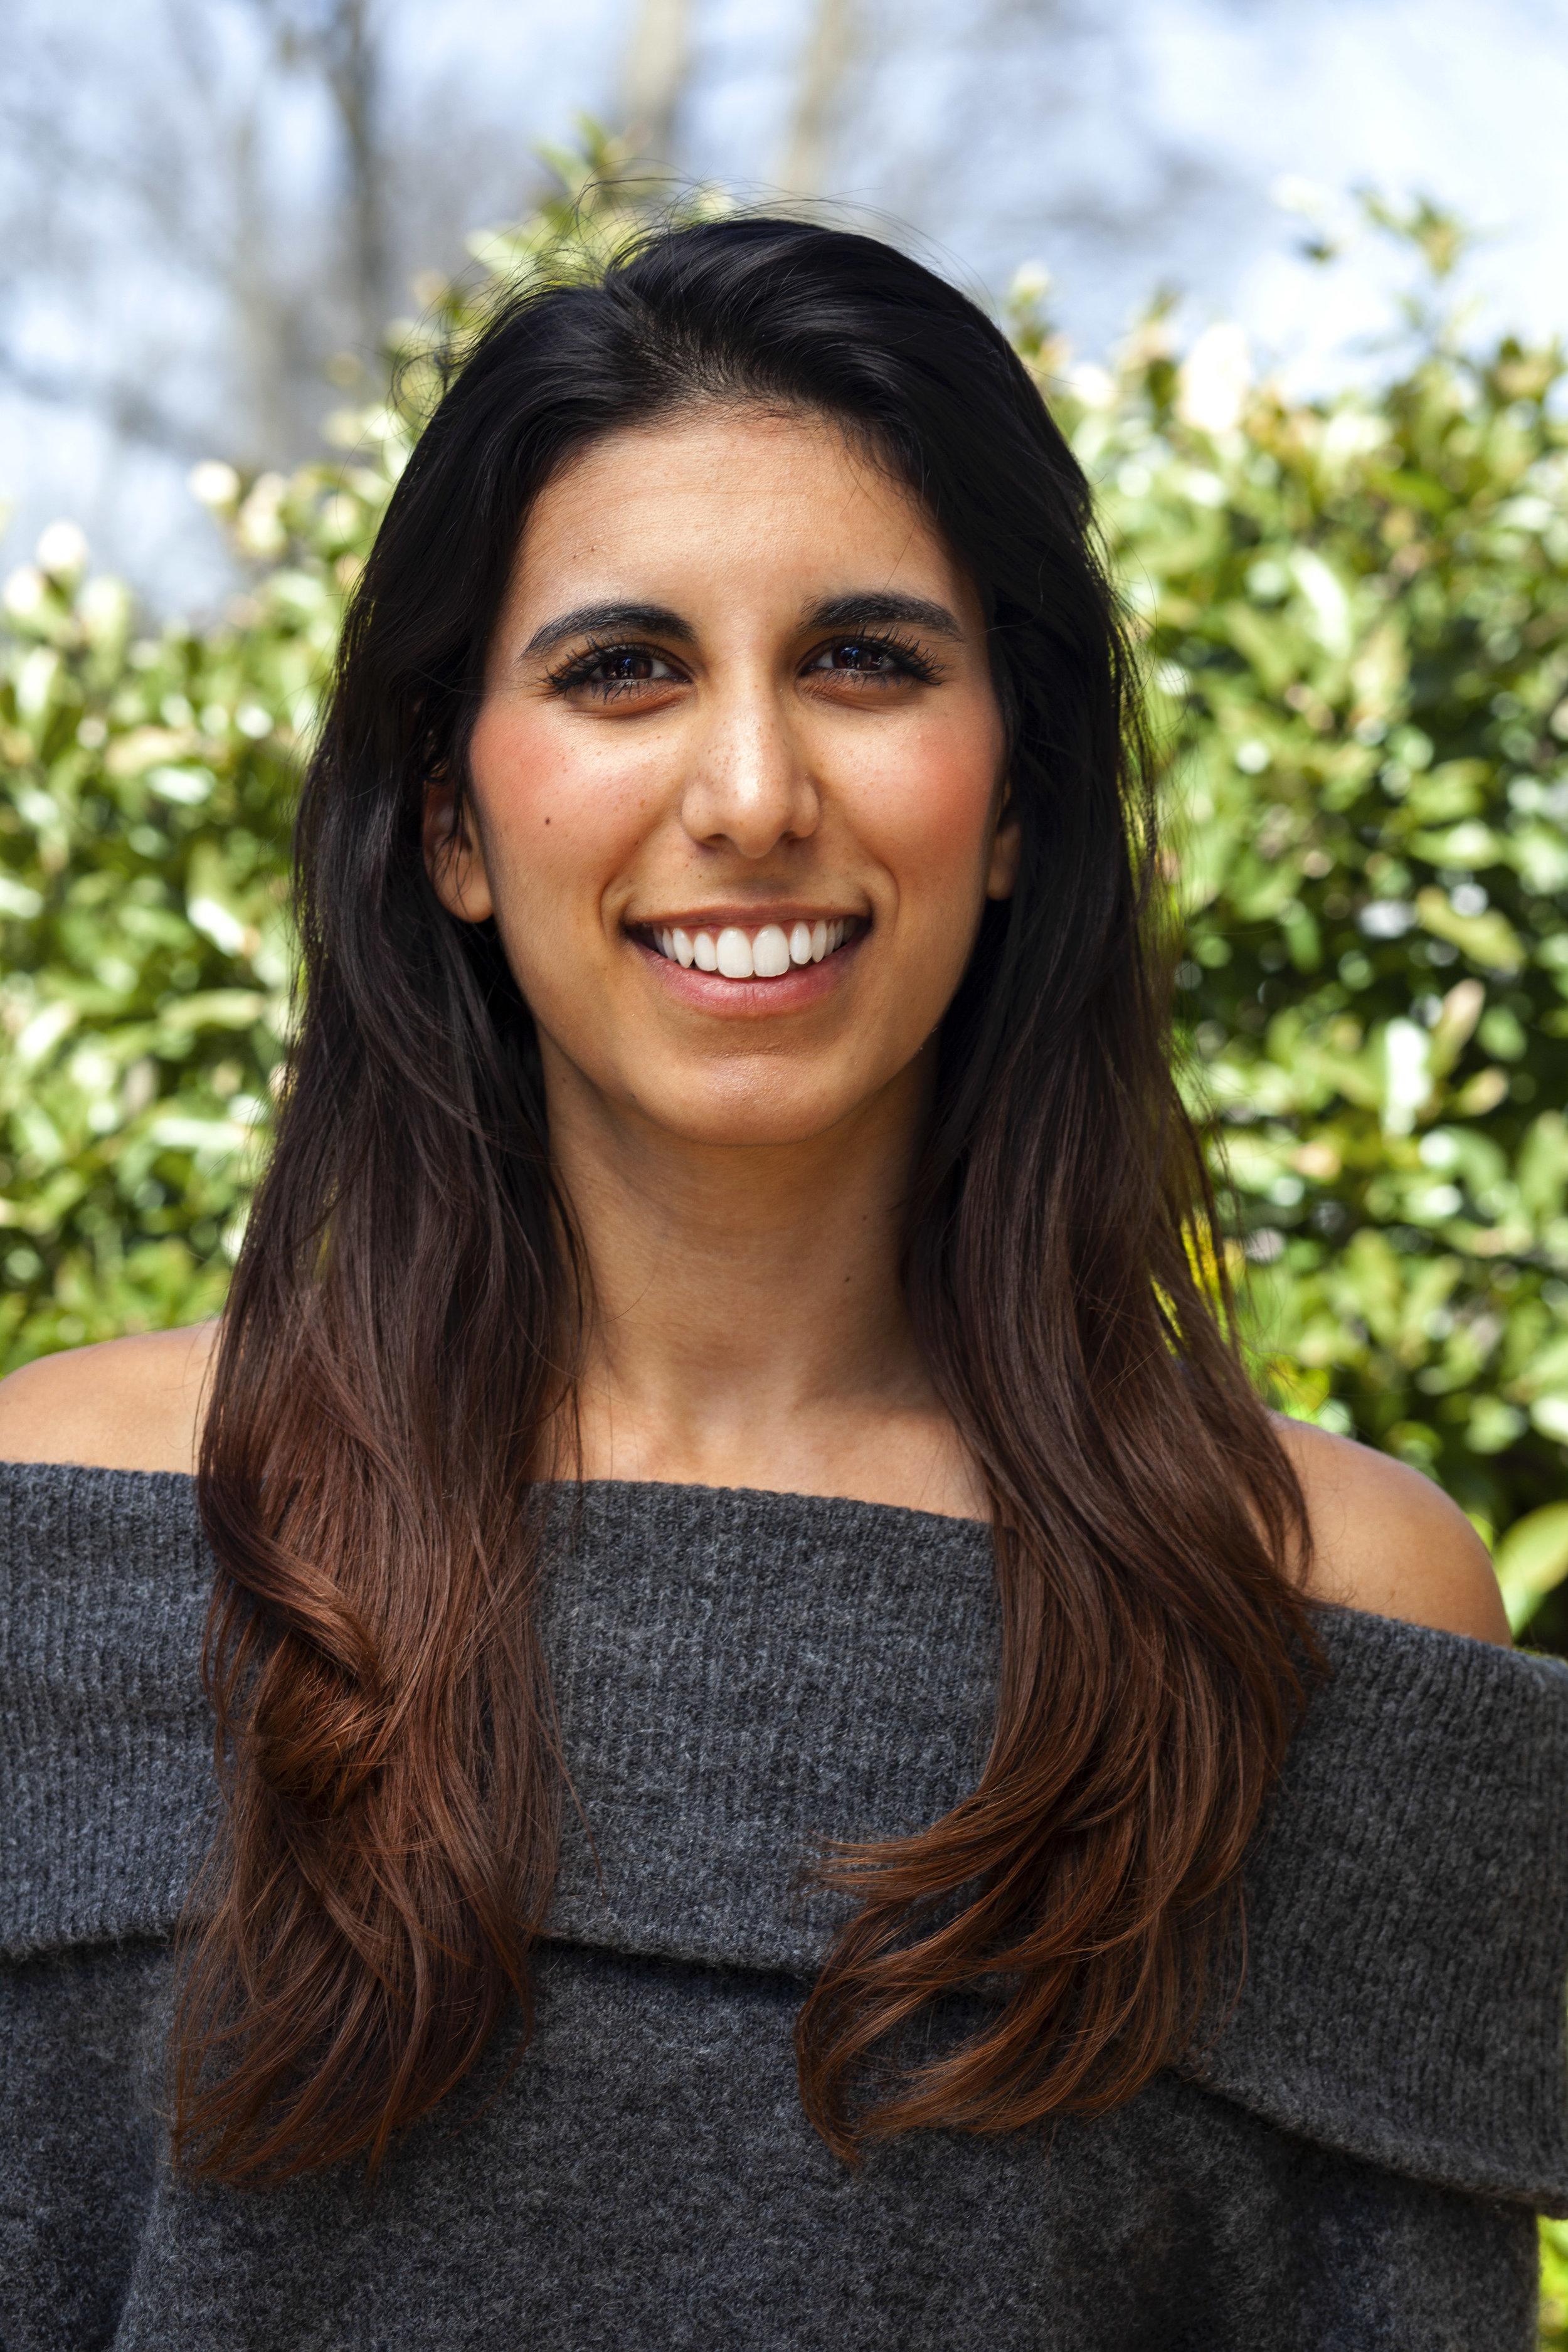 Stephanie Khoury / Editor, Junior Editor / NY